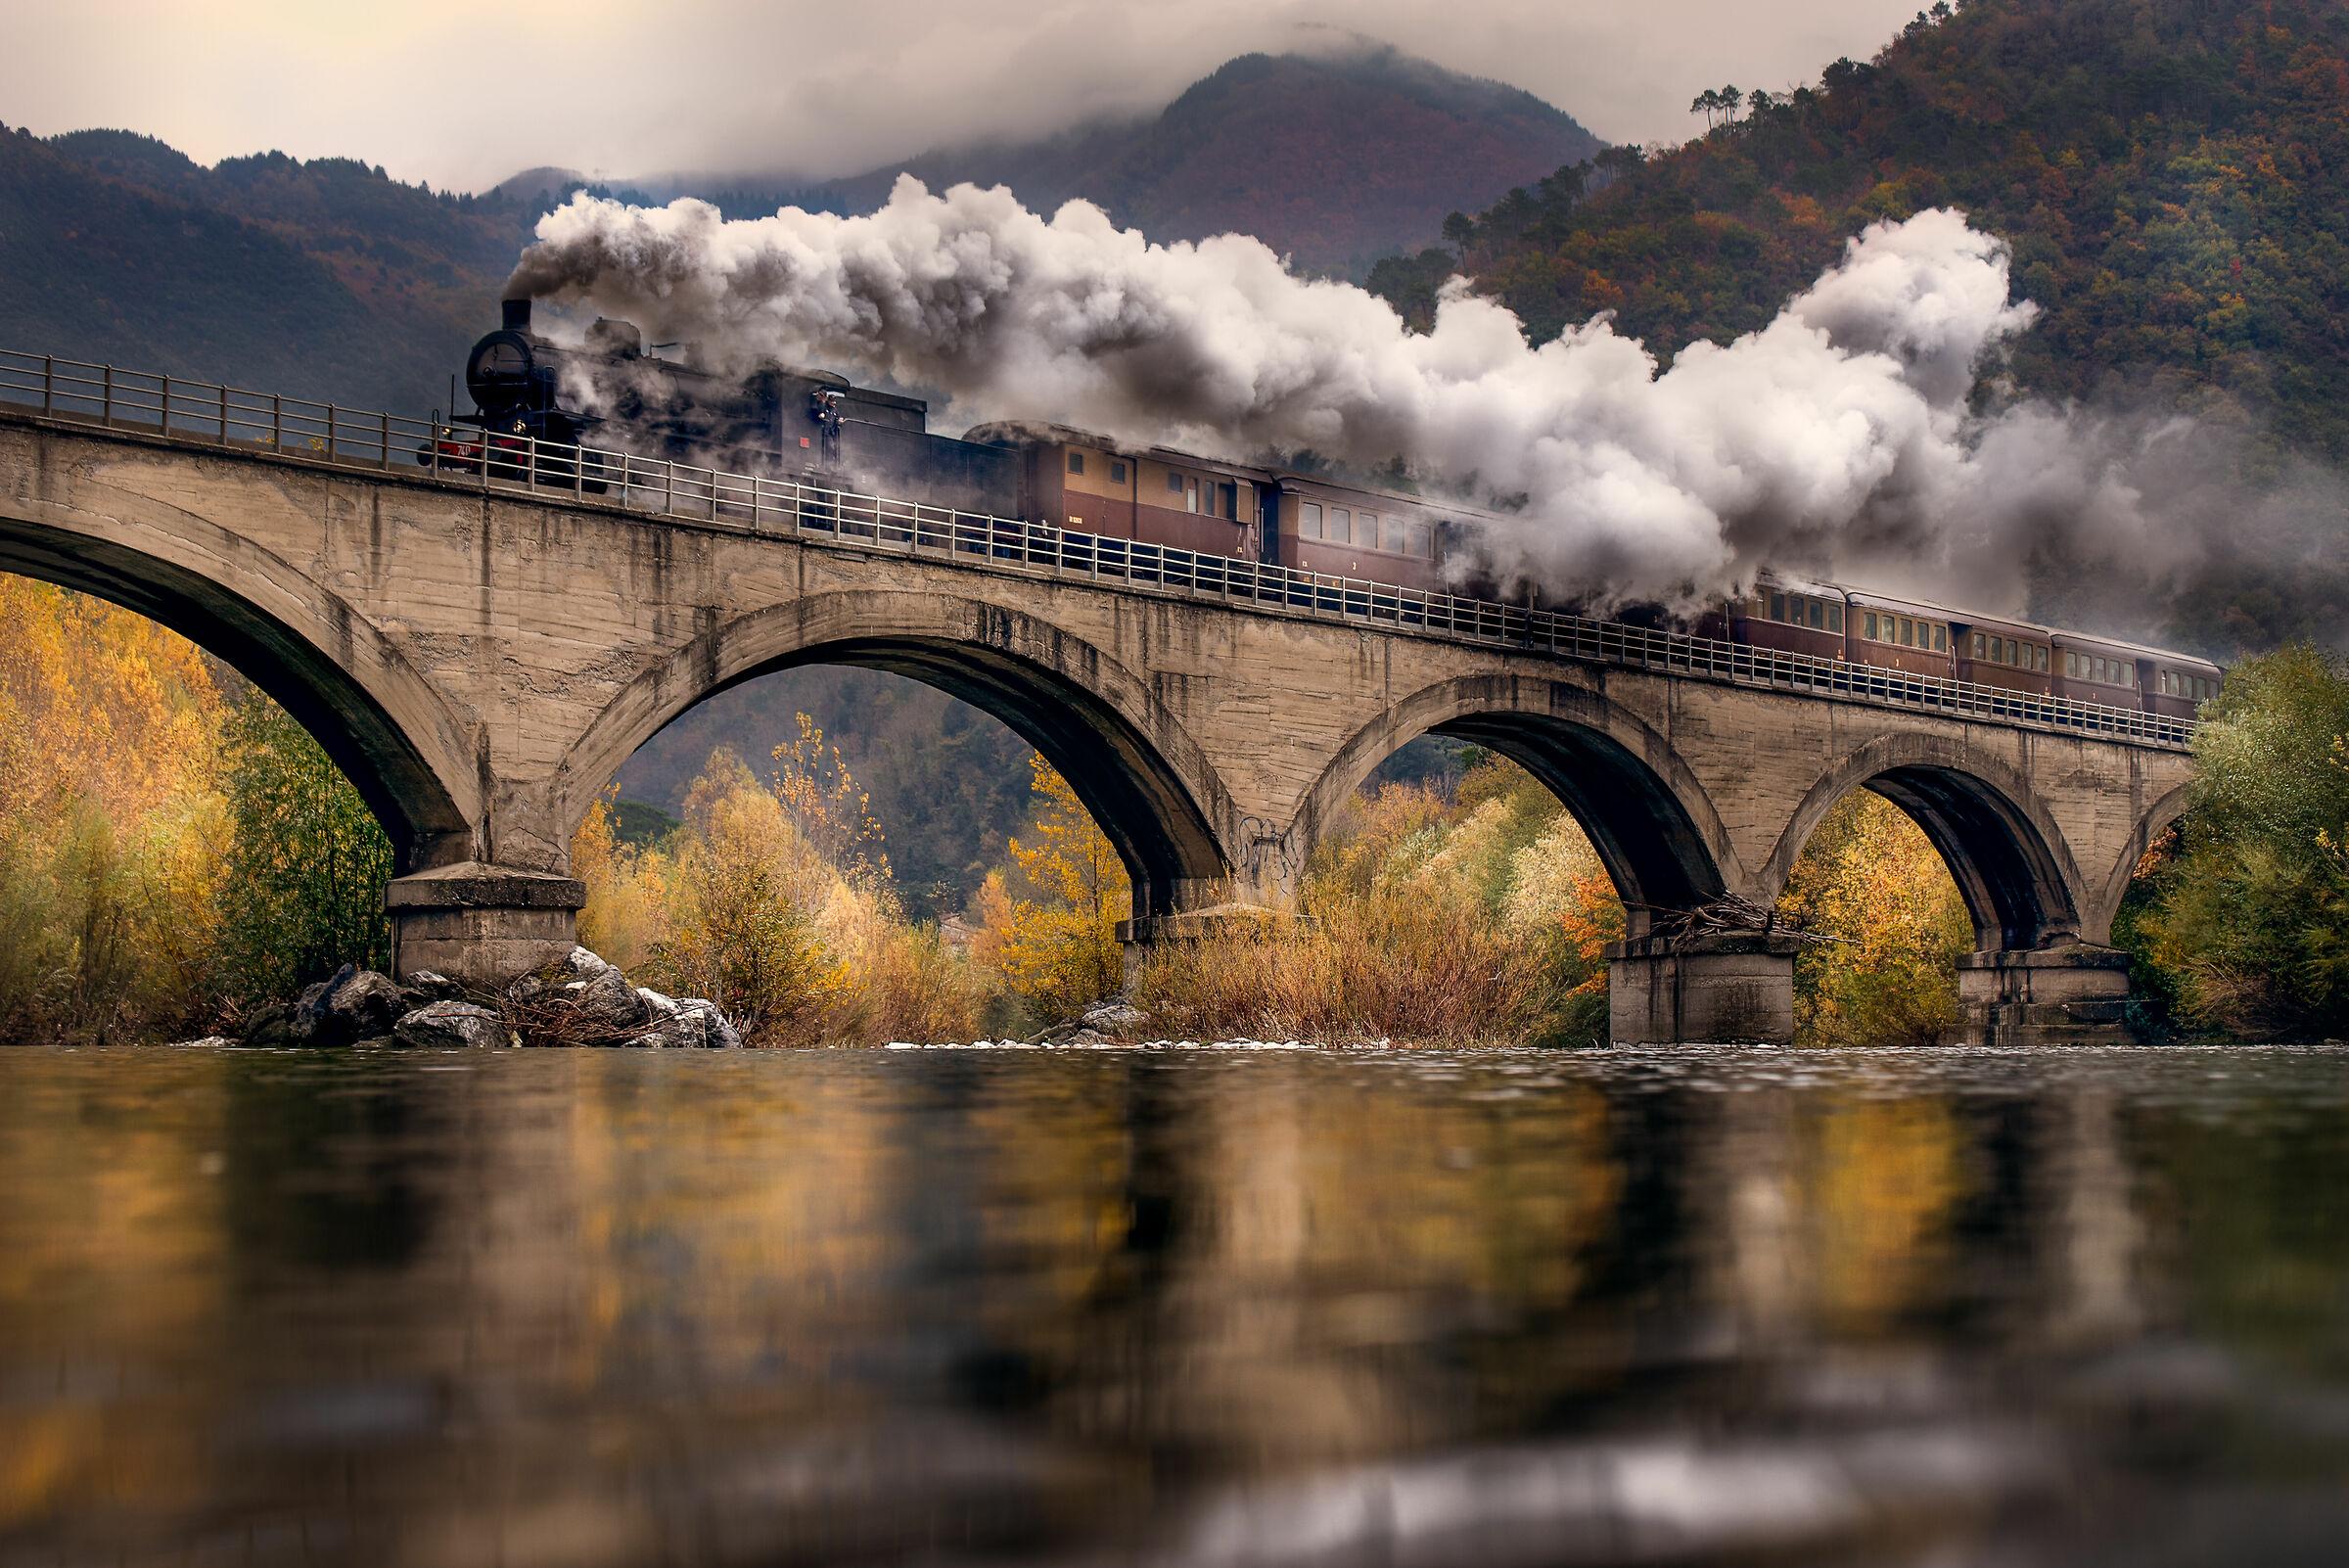 Trenino a vapore della Garfagnana...